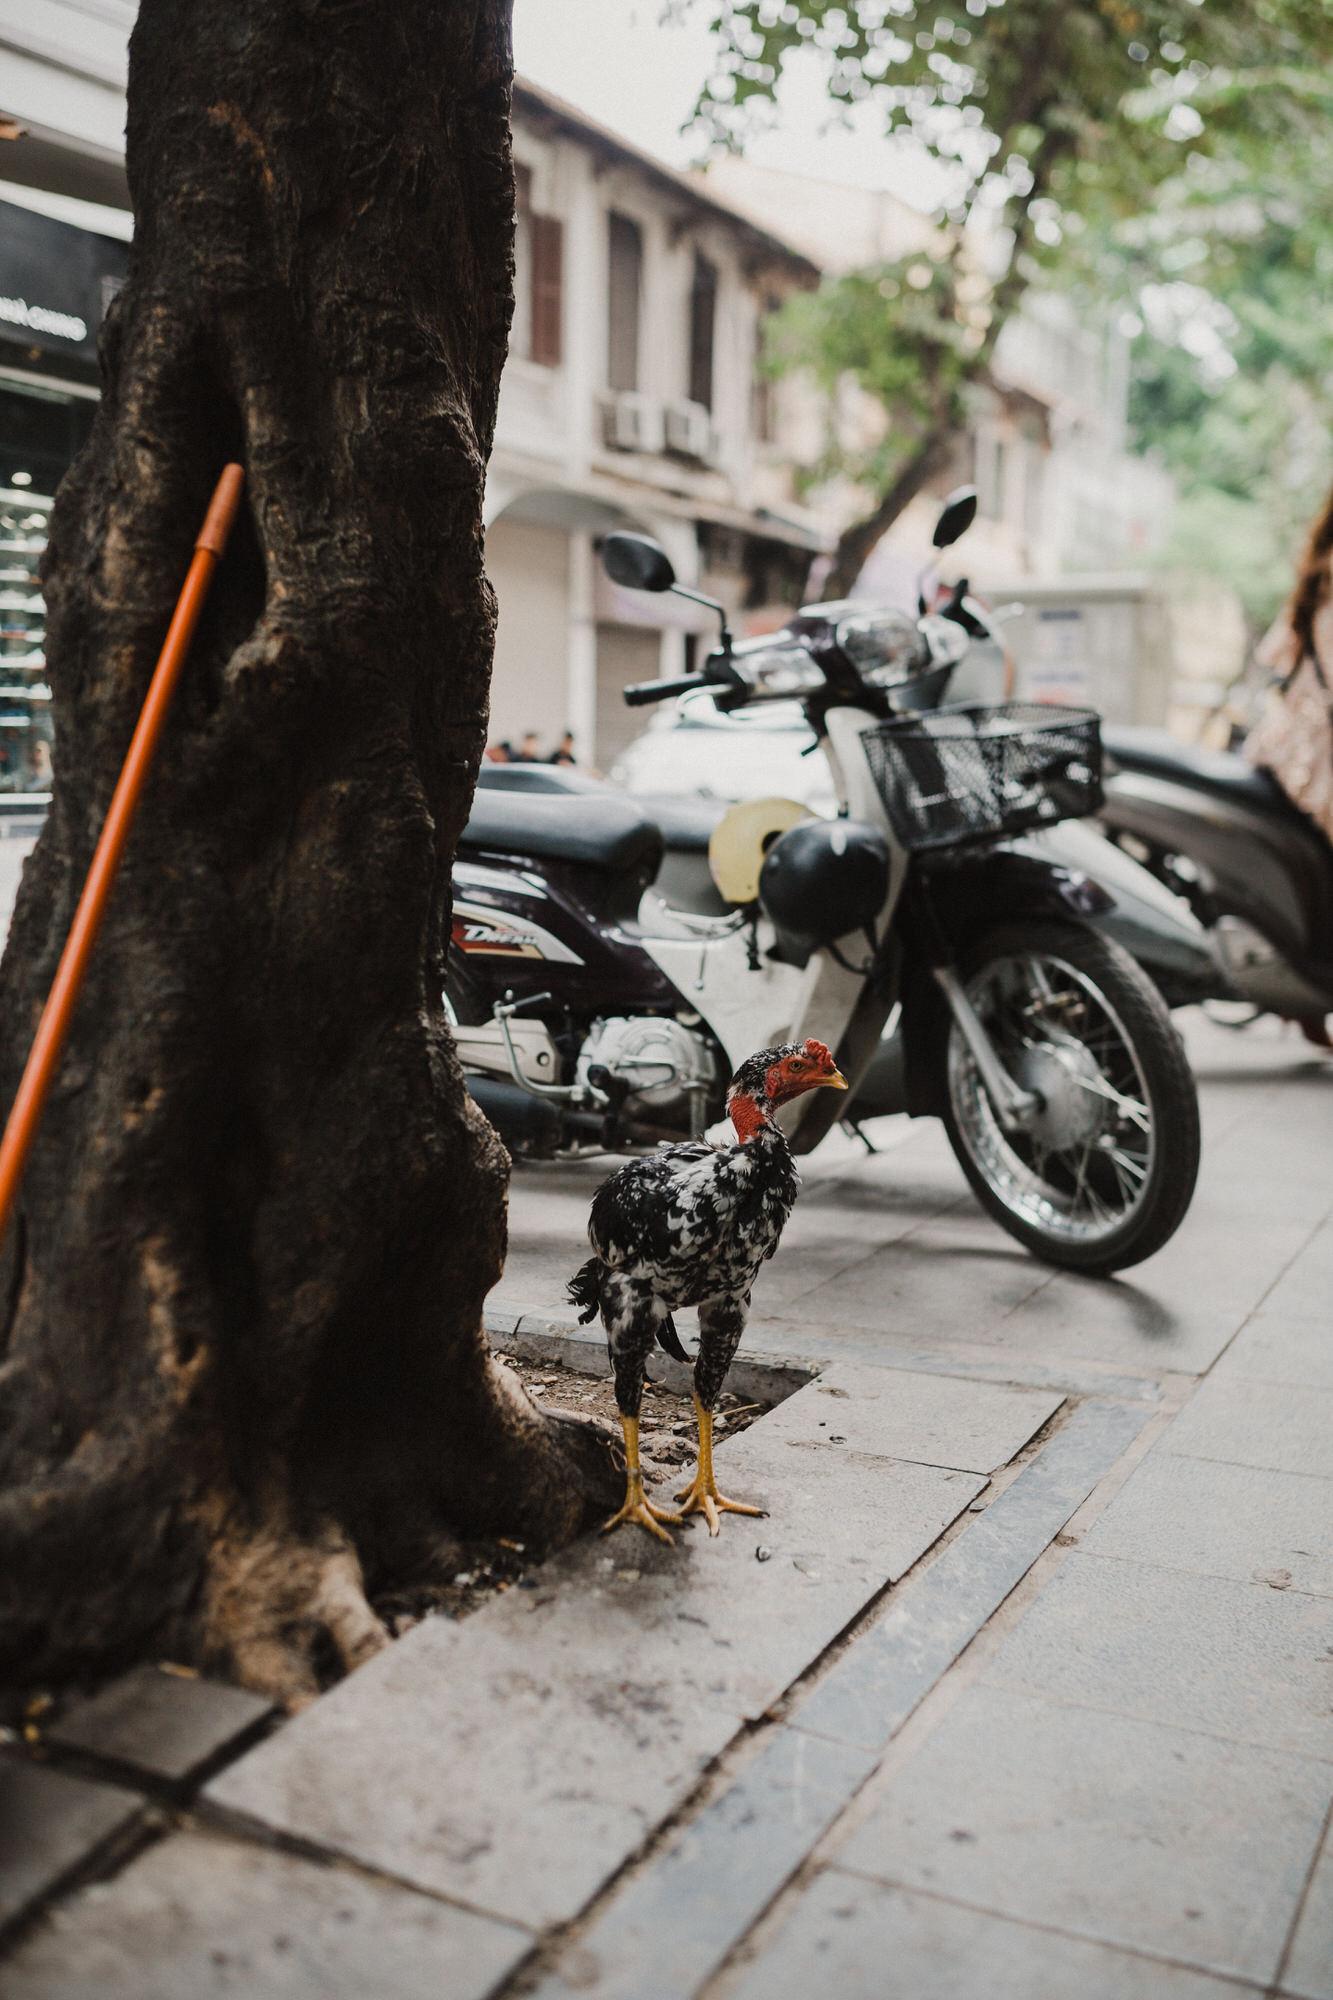 hanoivietnamcitytravelblog-9727-1.jpg